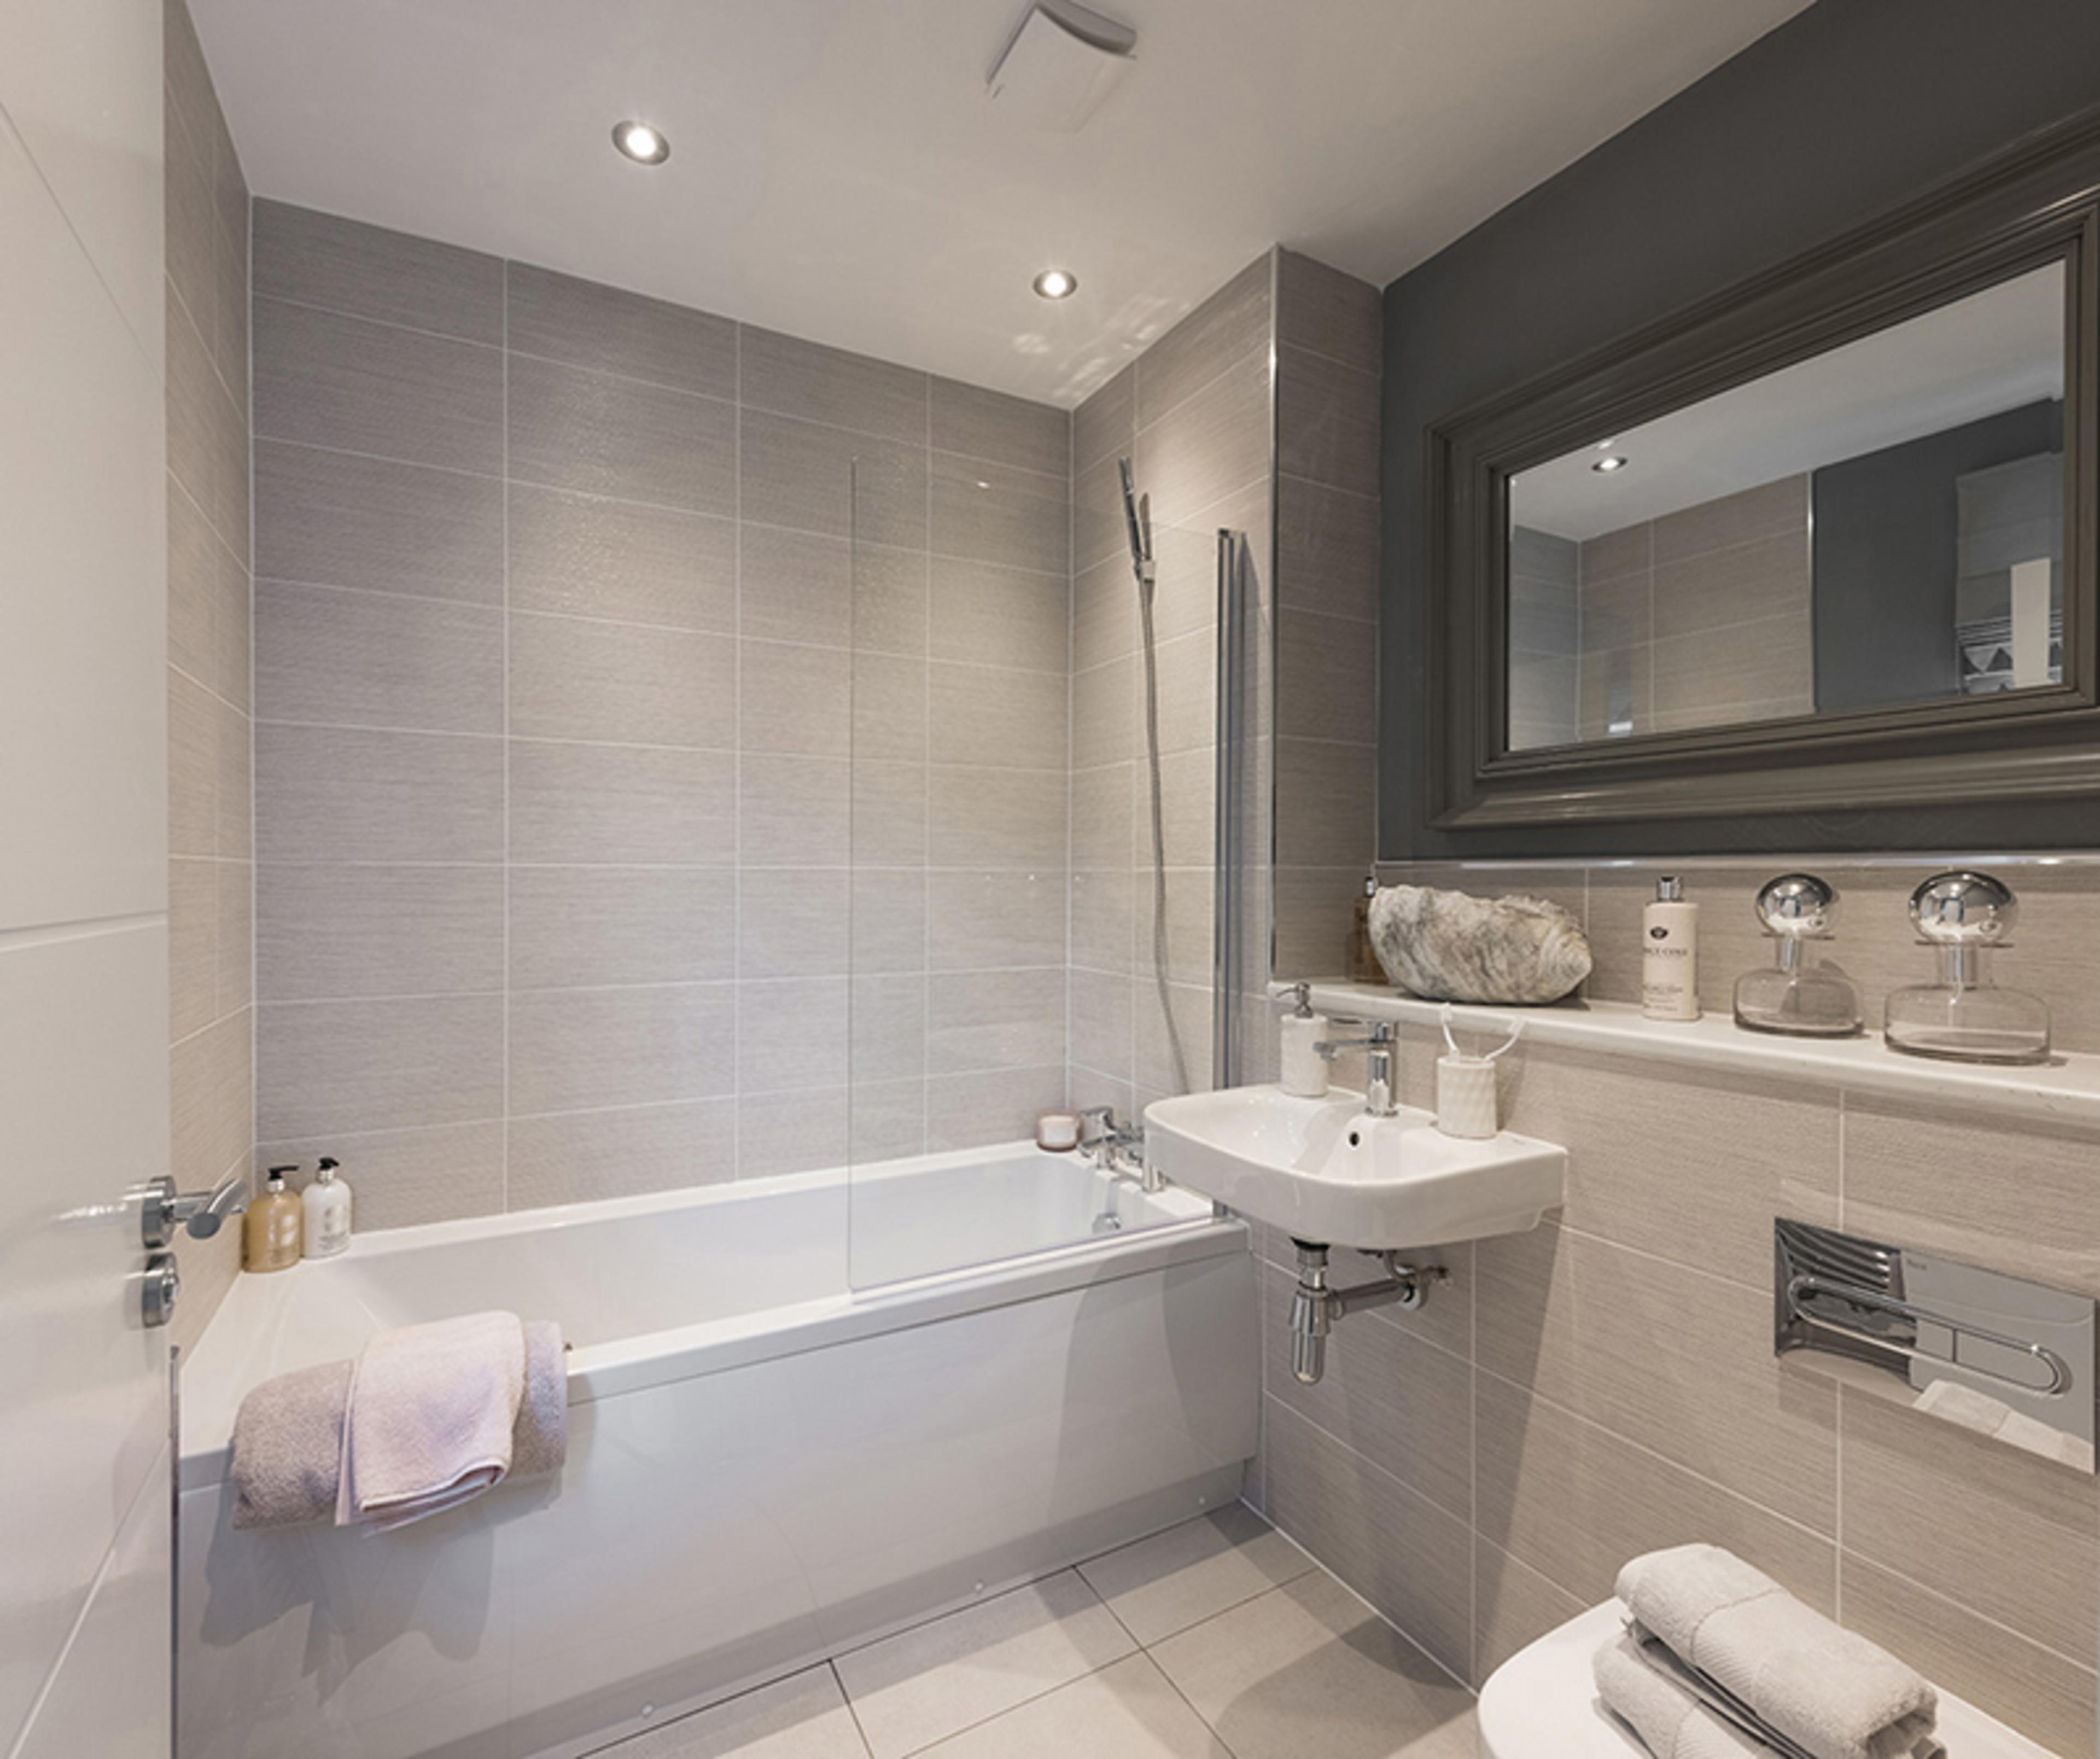 watling-grange-harrogate-calder-3-bed-home-bathroom-square-1